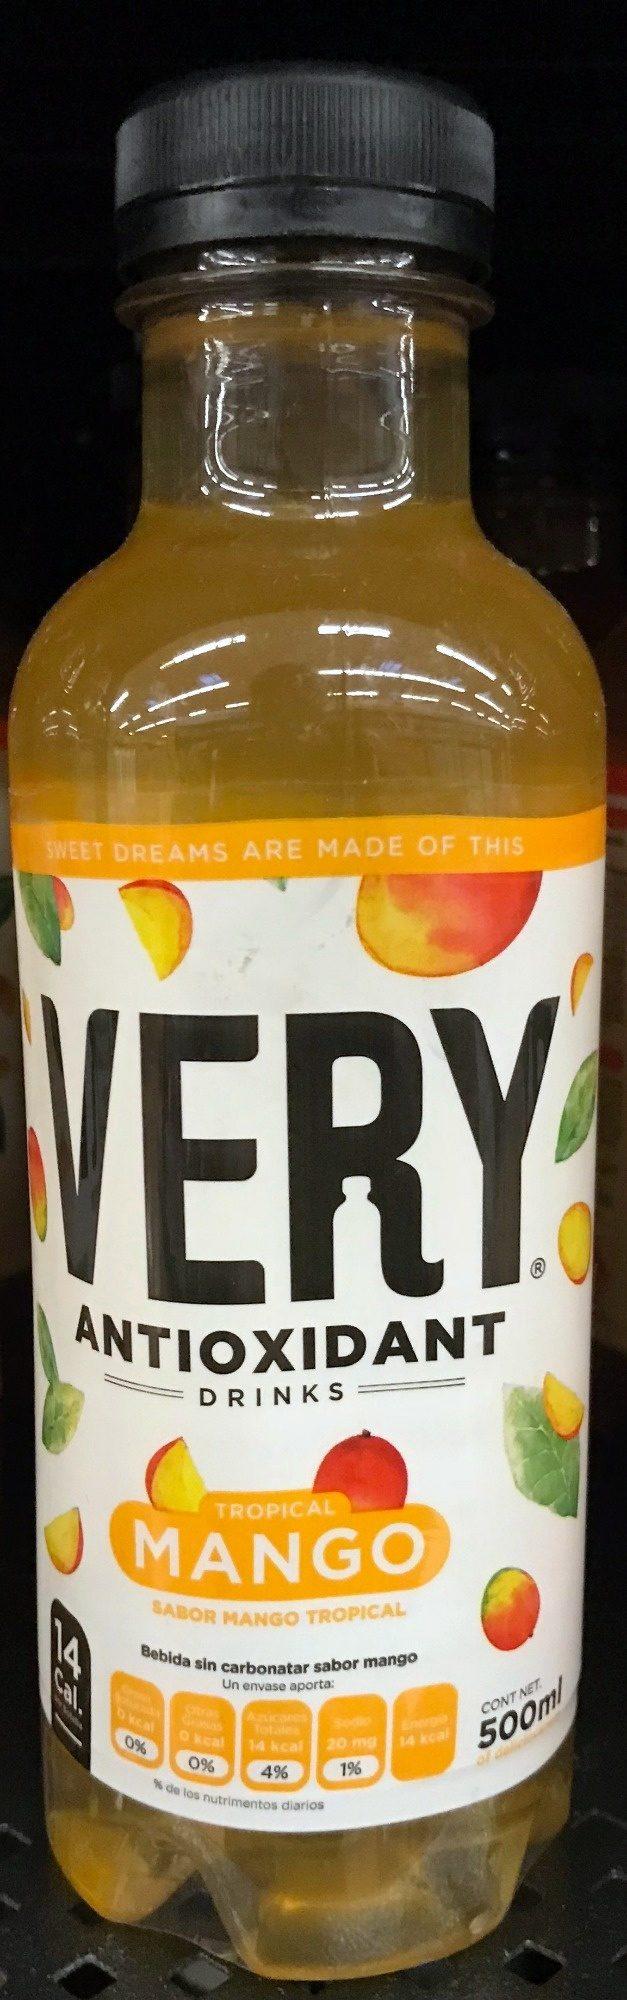 Very sabor Mango - Produit